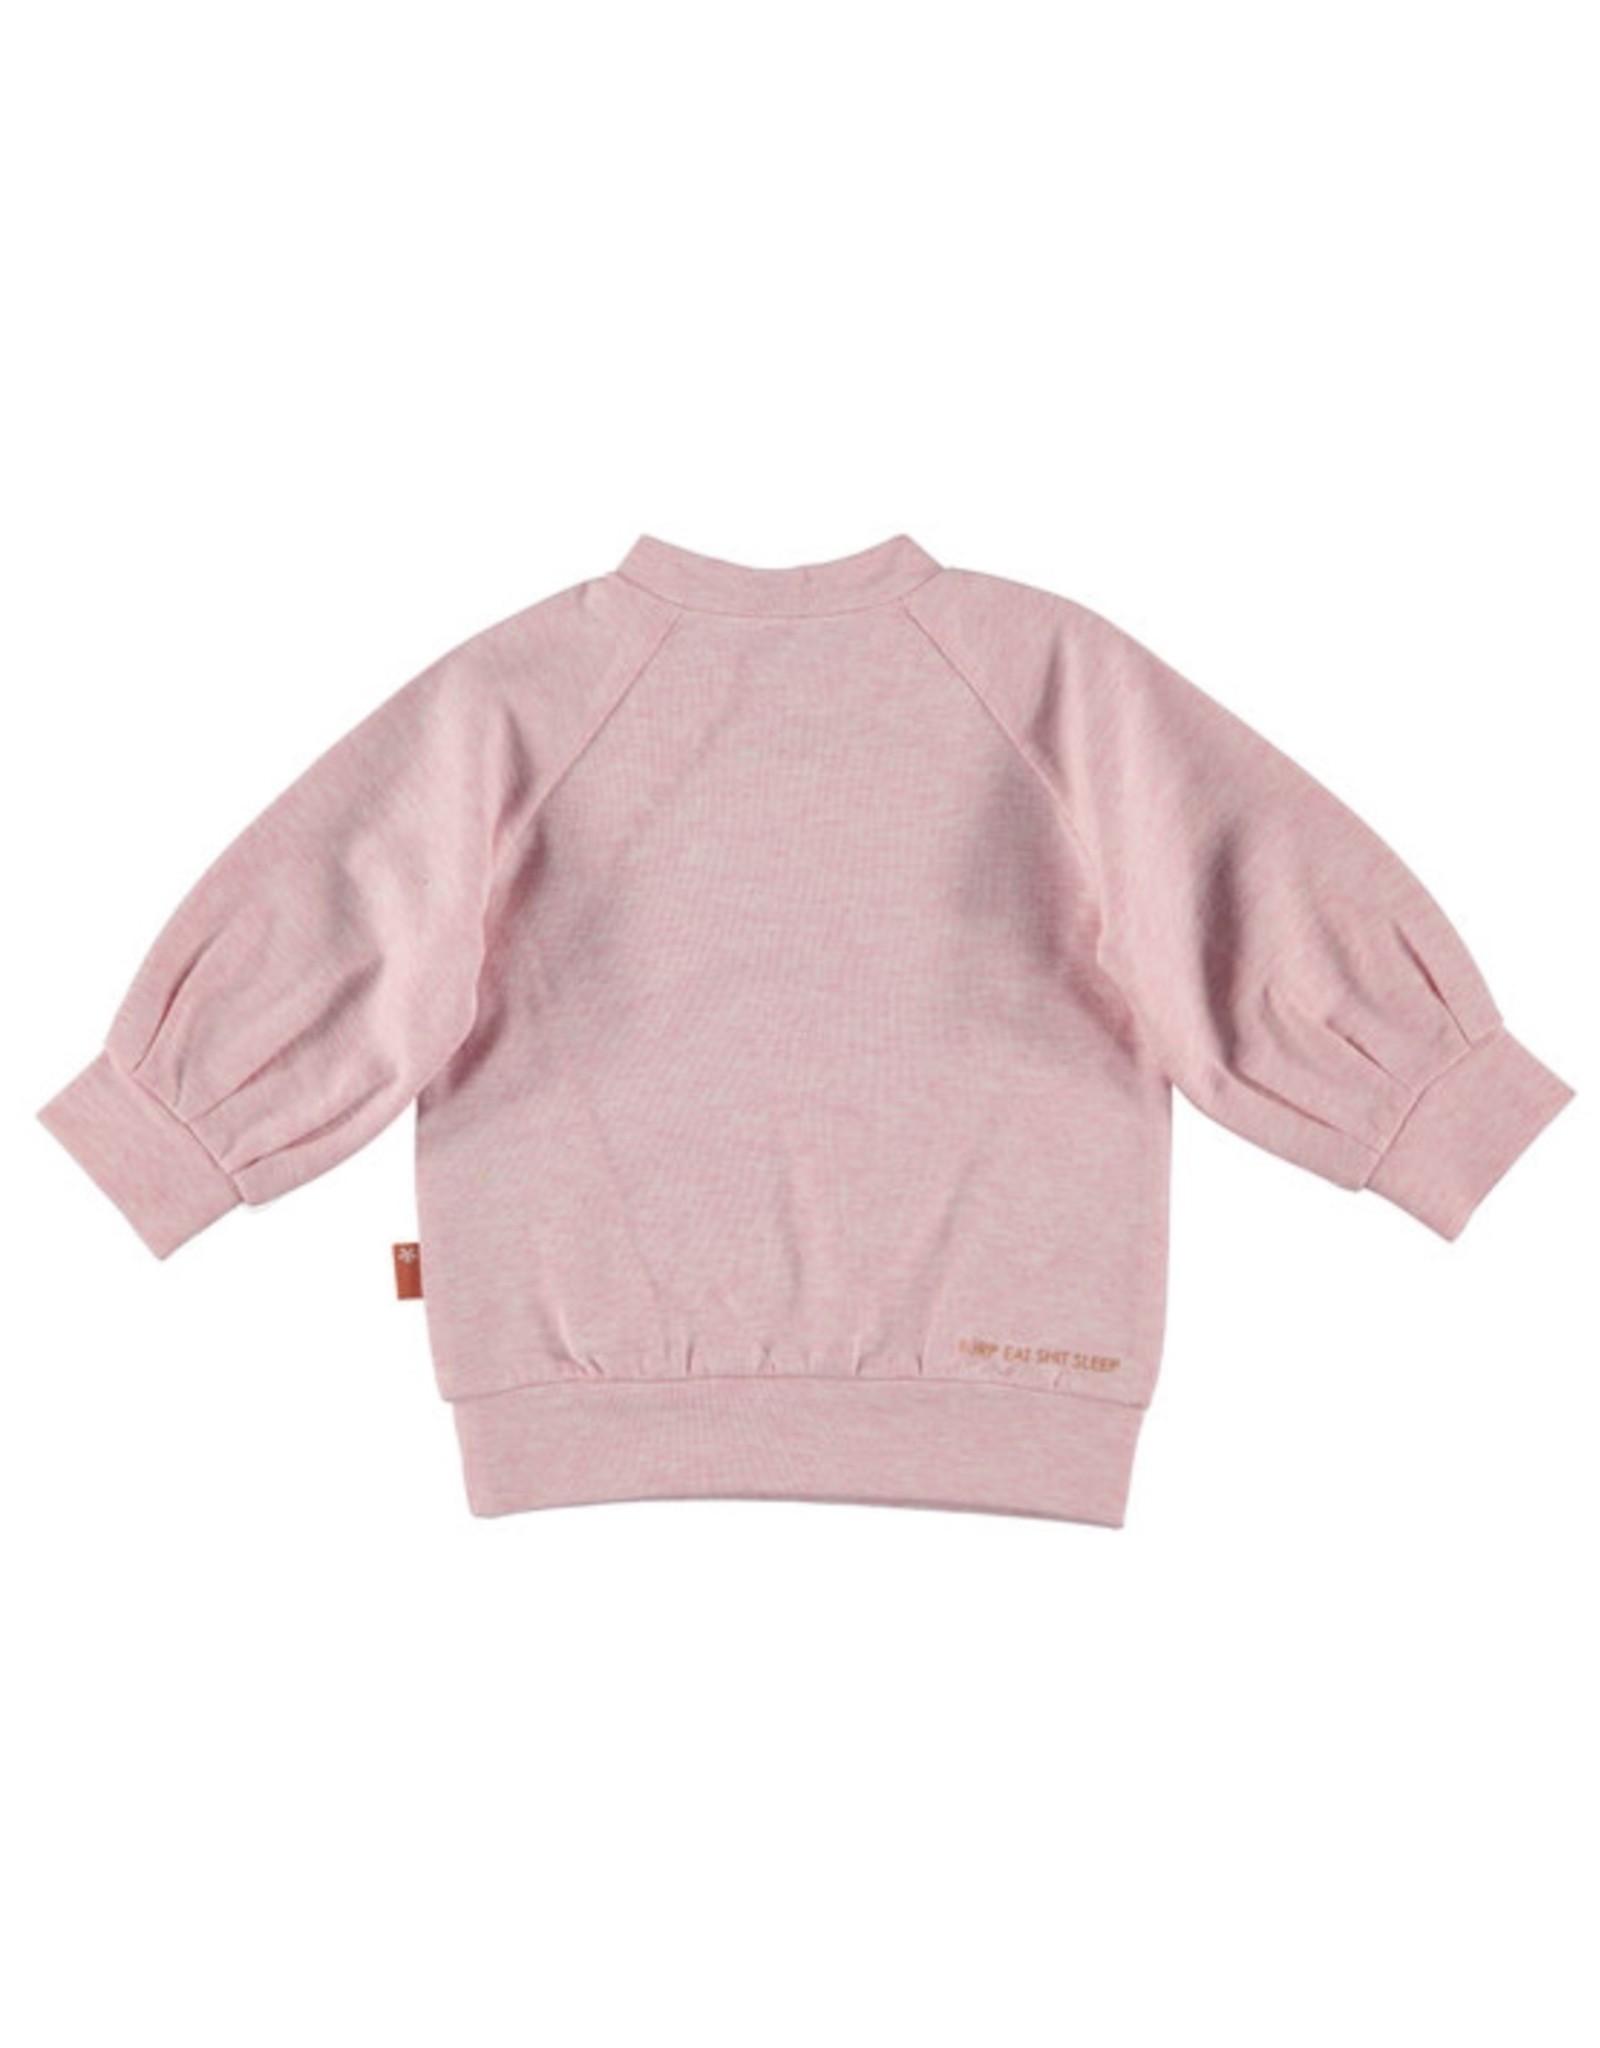 B*E*S*S 21011 sweater